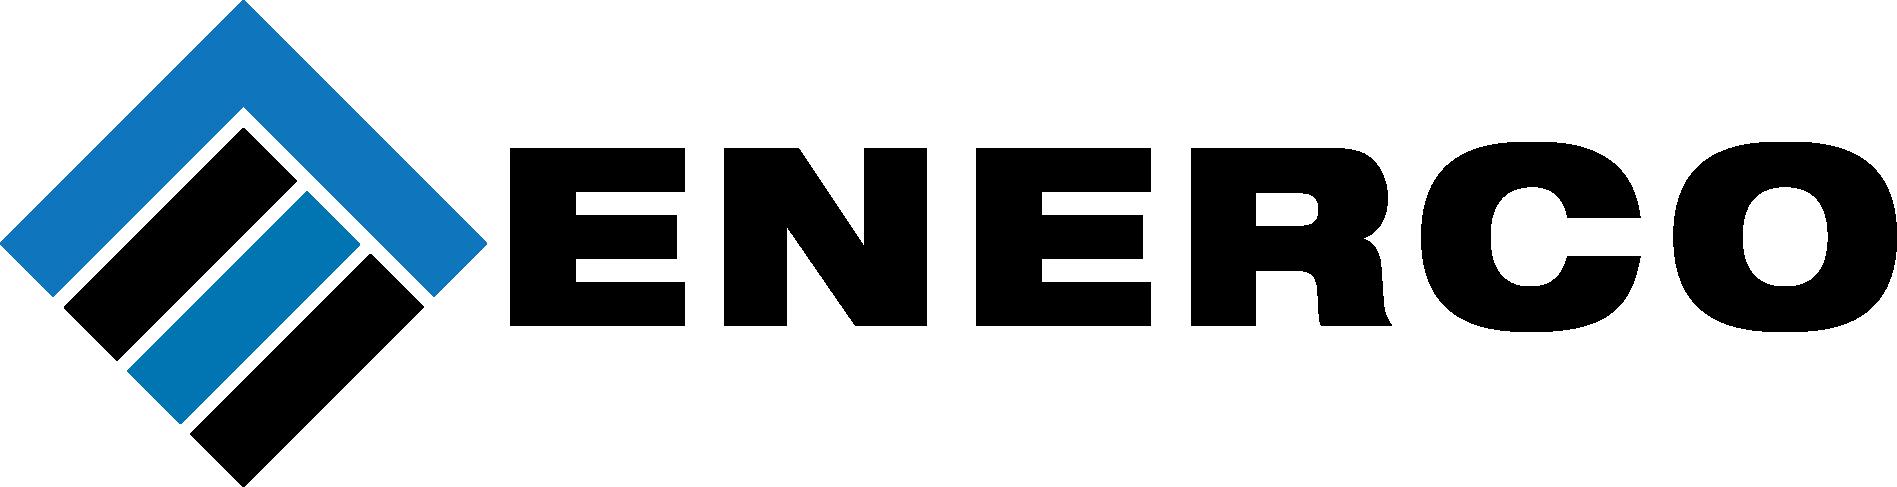 Propane Adapter (1/4in Male Pipe x 1in20 Male Throwaway Cyl Threads) Bulk